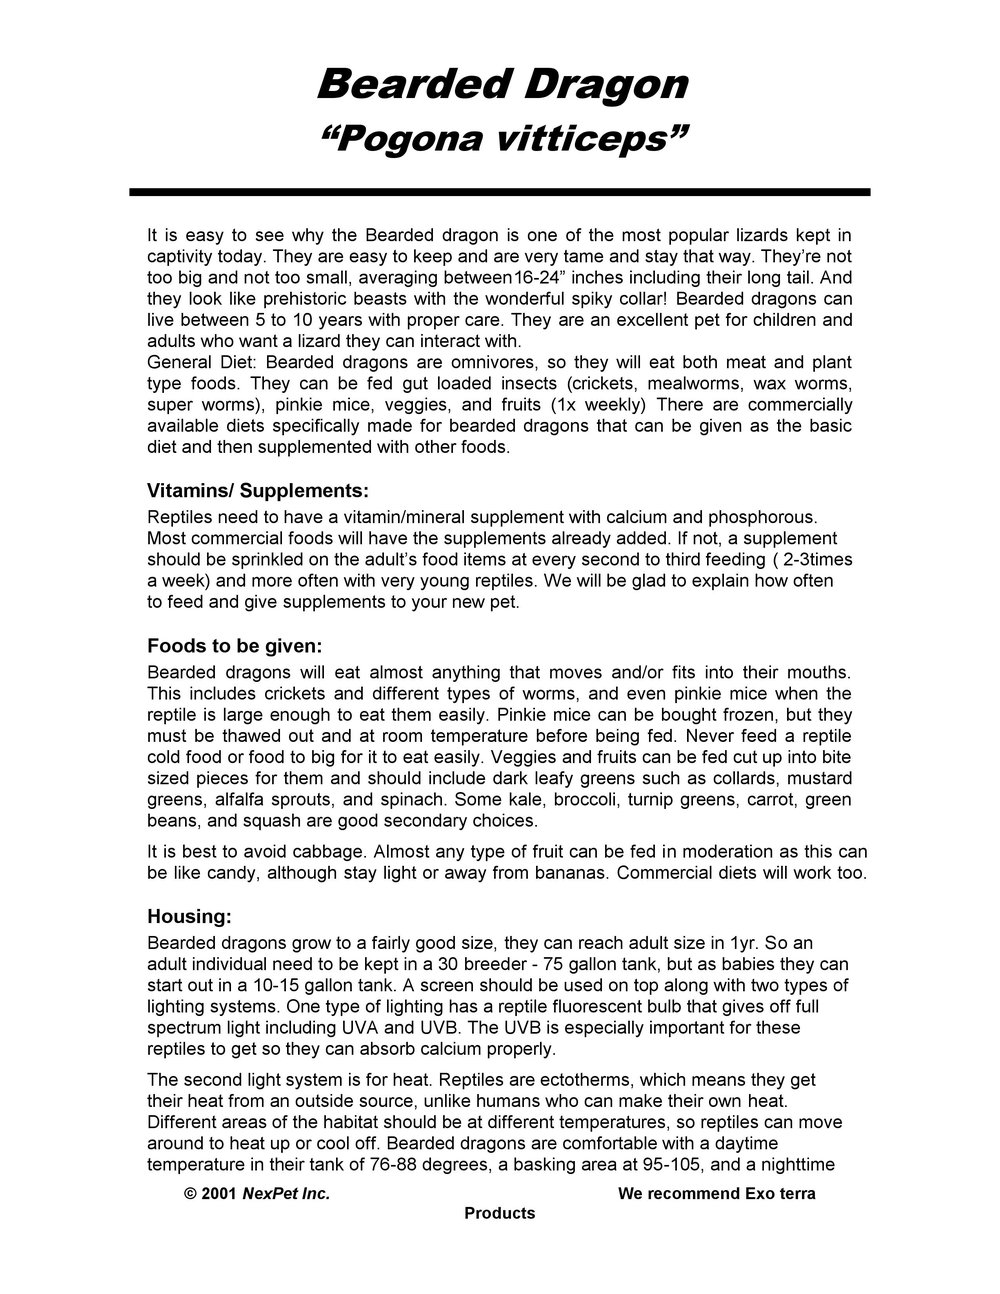 Bearded Dragon Care Sheet pg1